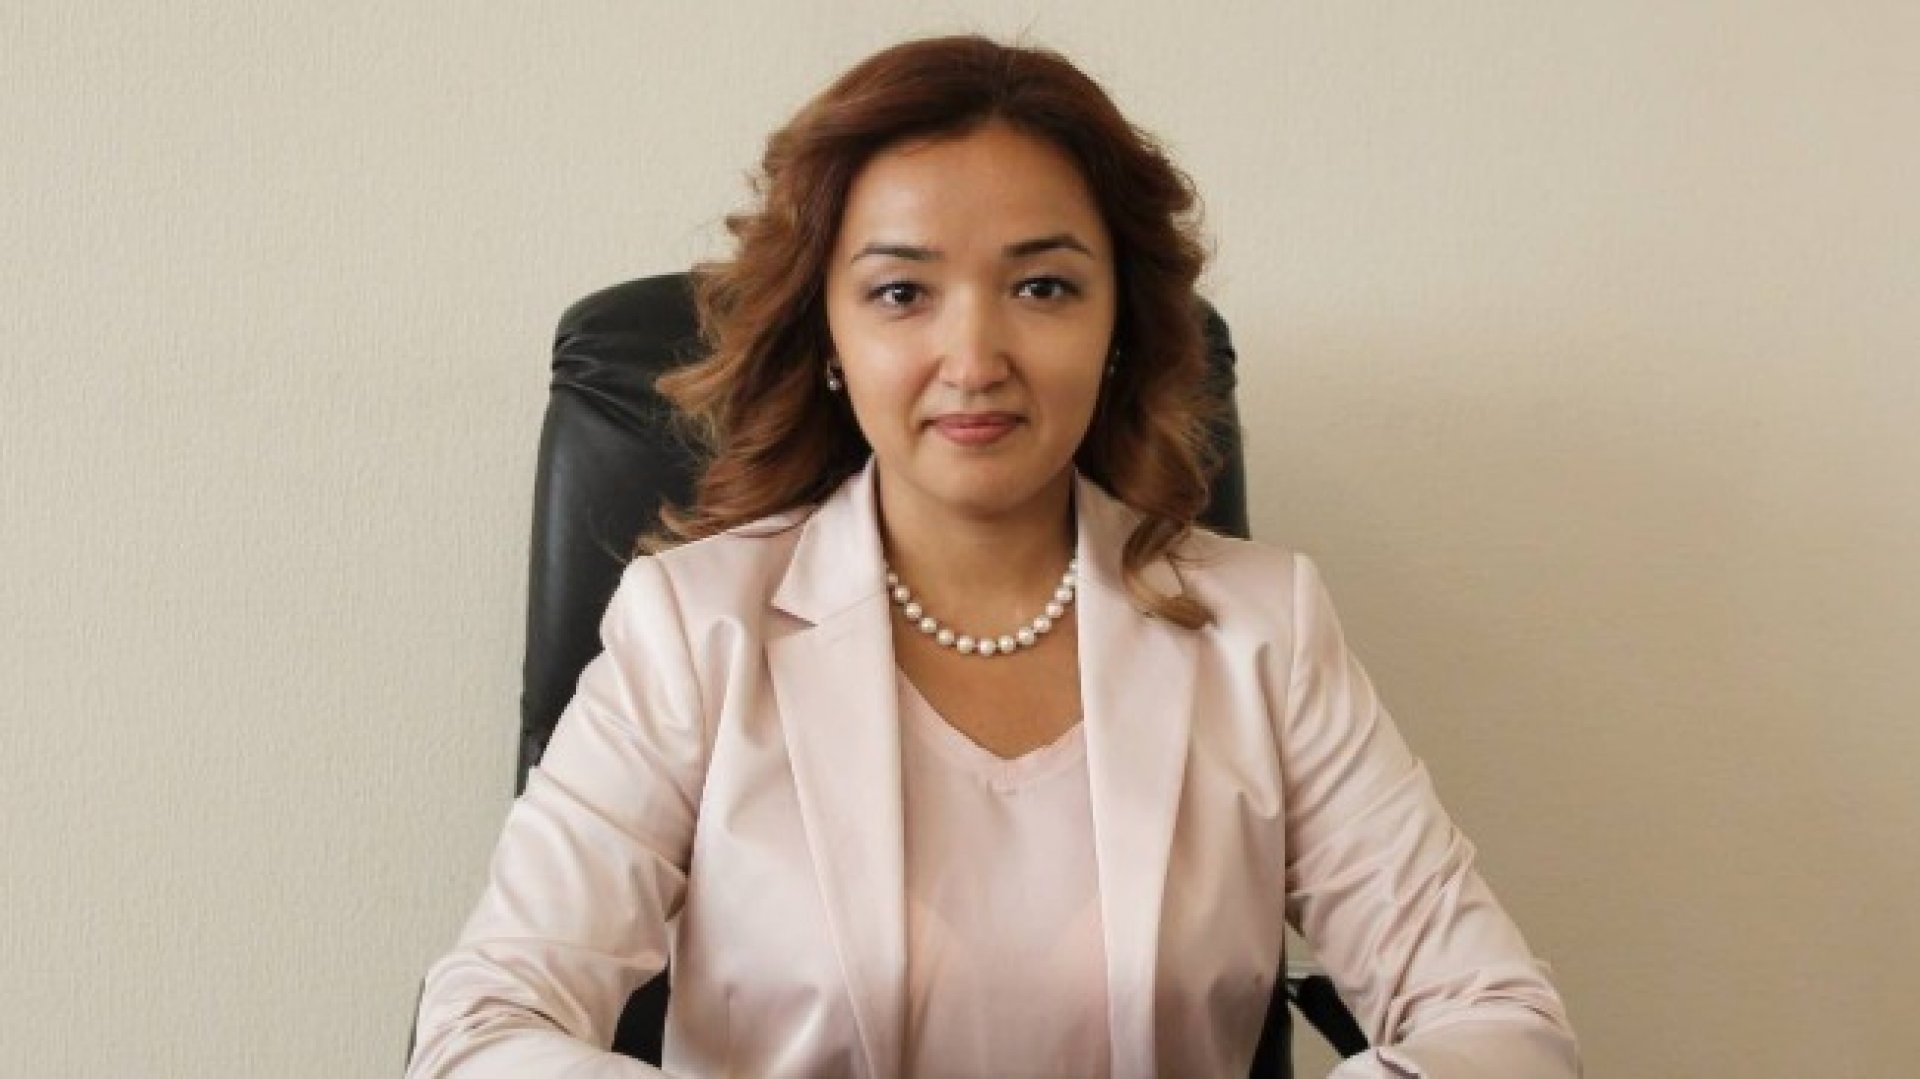 Назначен новый вице-министр индустрии и инфраструктурного развития Казахстана